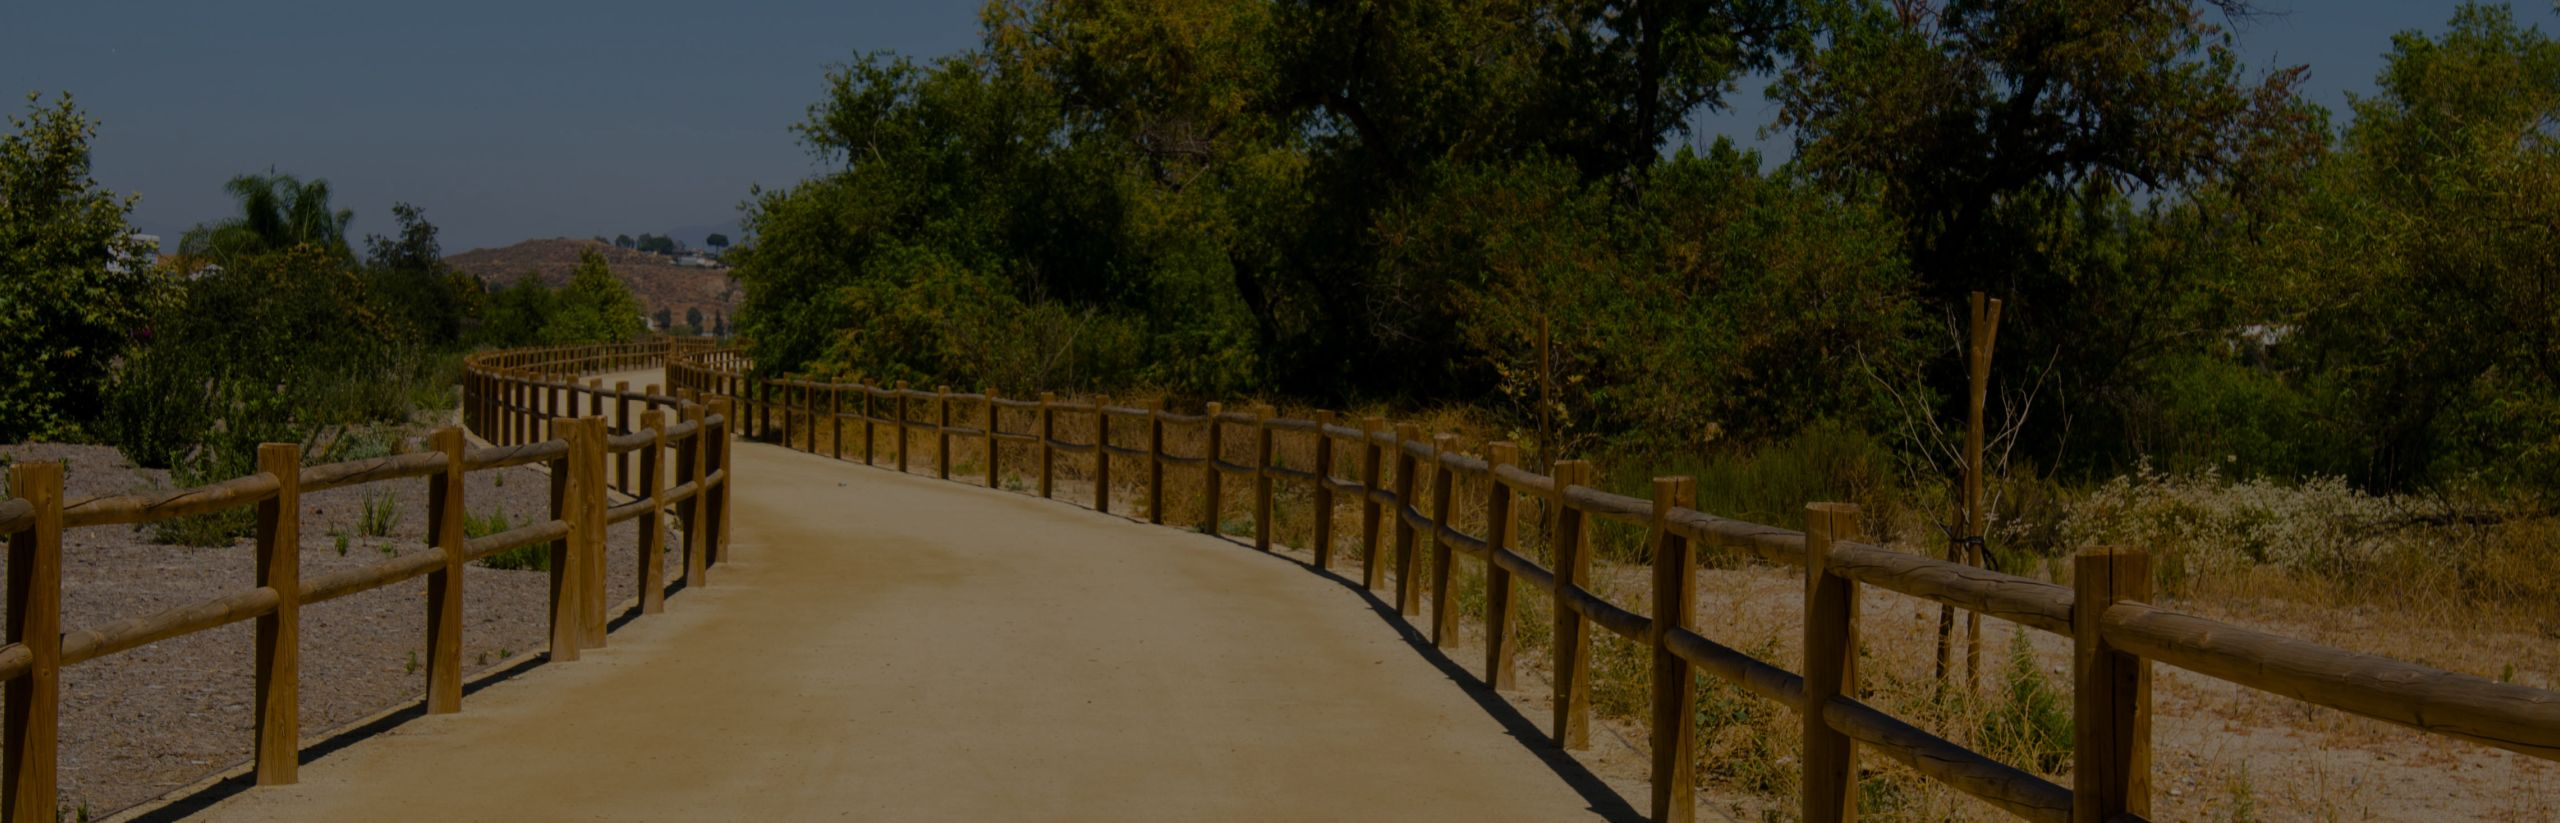 Award Winning Parks - Walker Preserve Trail